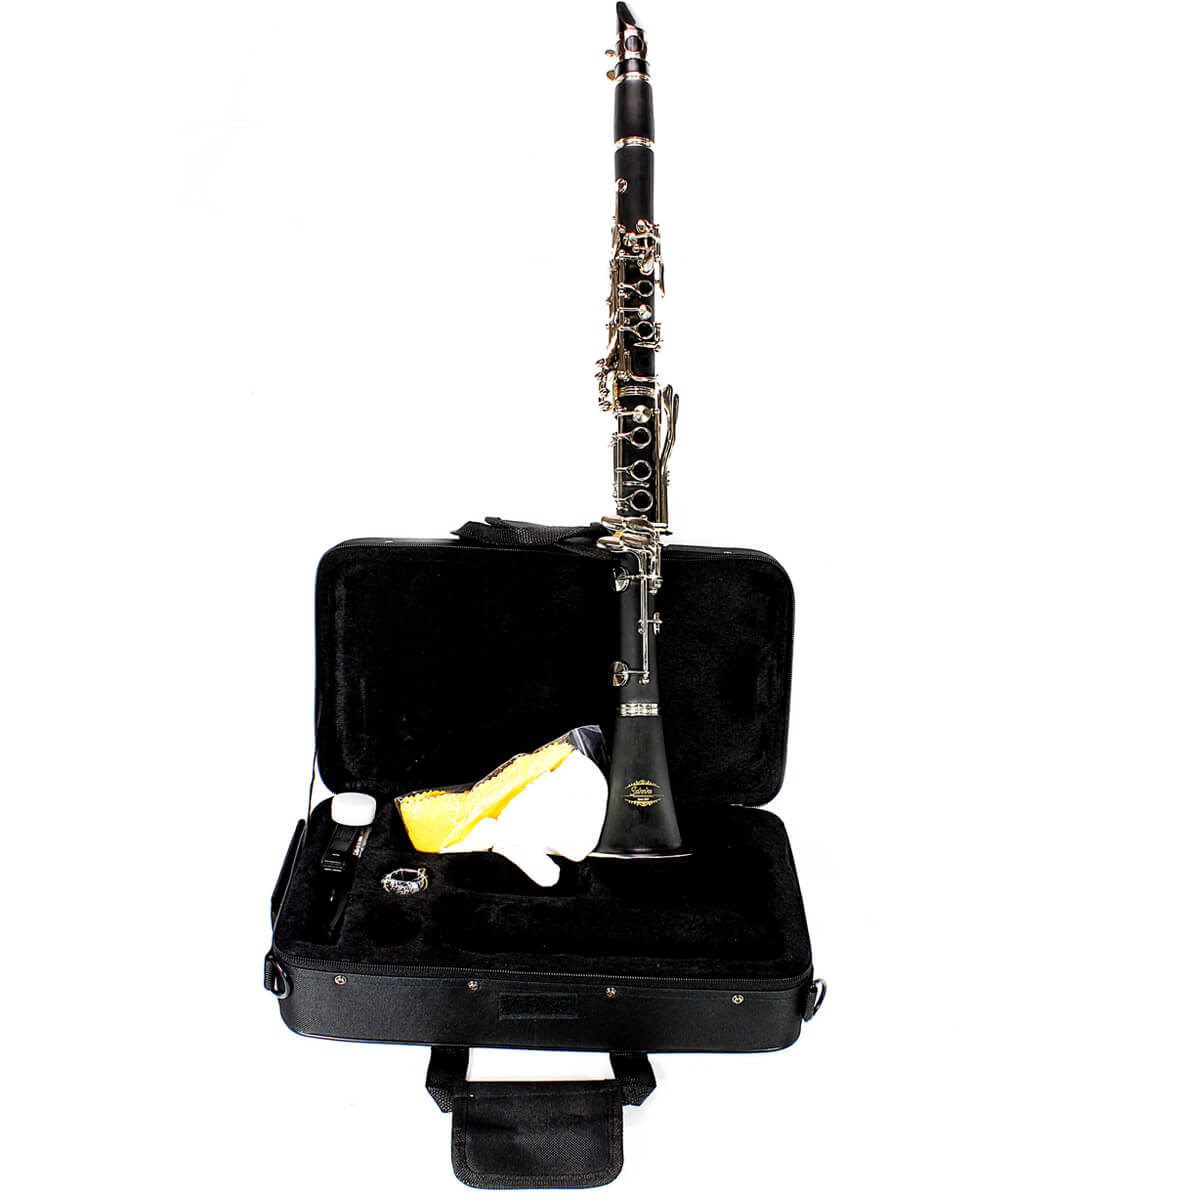 Clarinete - Jahnke - 17 Chaves - Niquelada